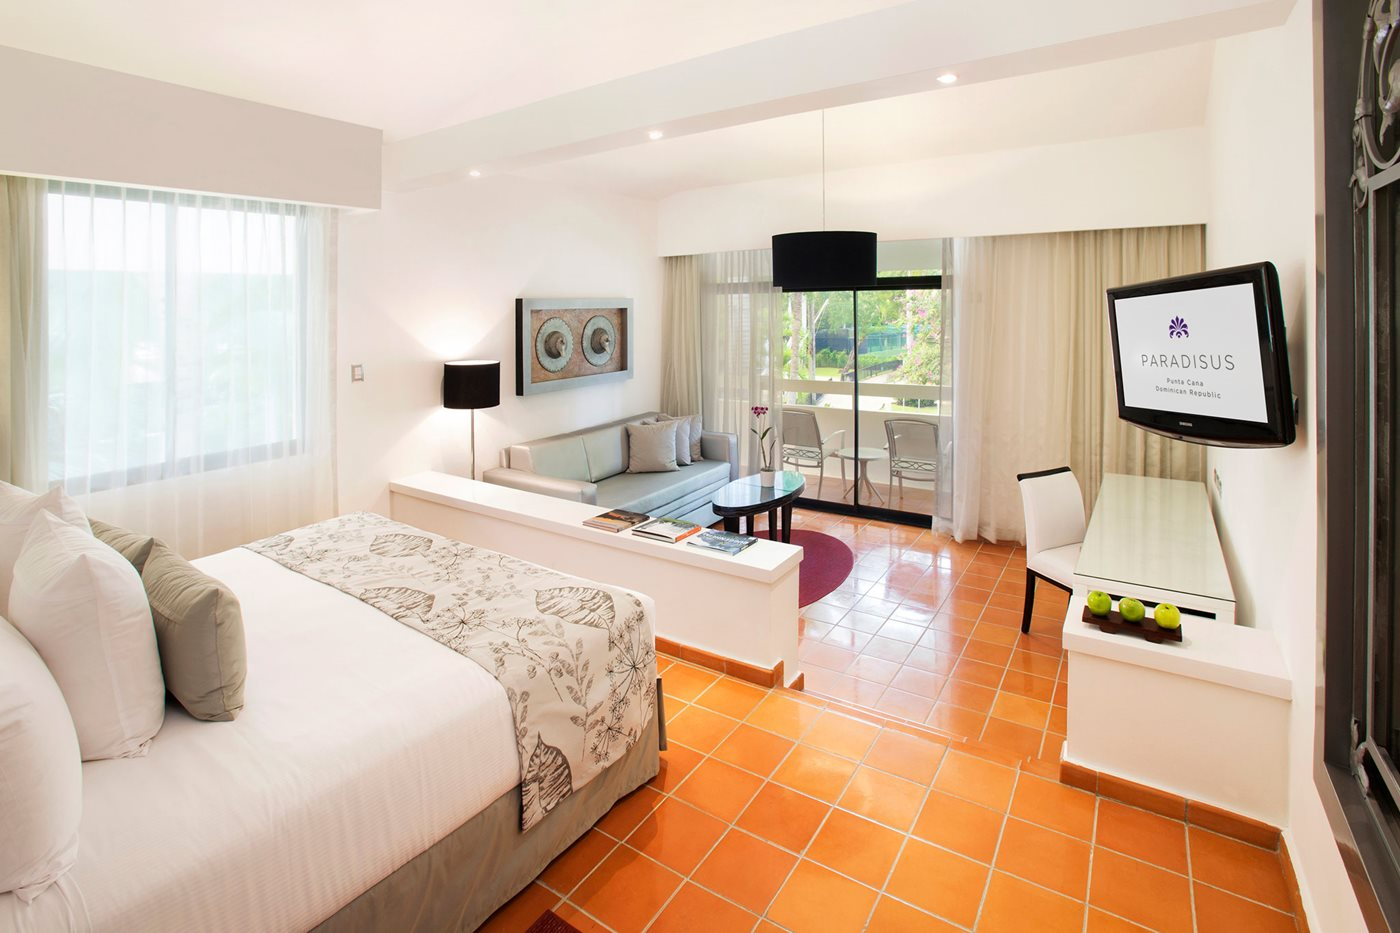 Rooms Paradisus Punta Cana Resort Punta Cana Transat